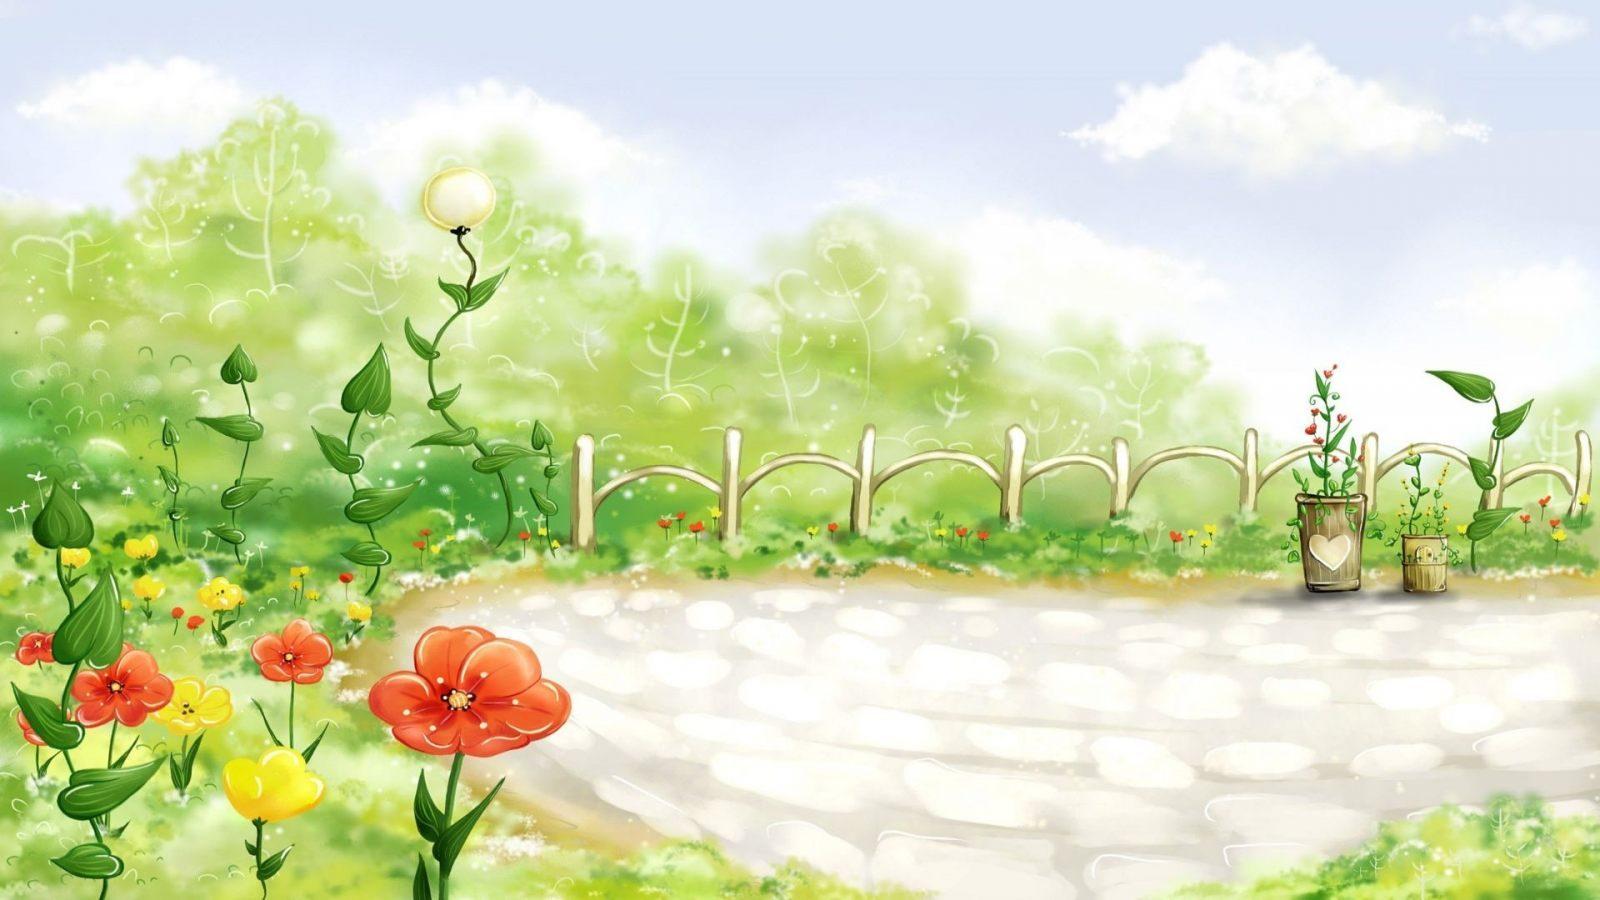 Desenhos Para Colorir De Aco Ires further Galerias Dibujos De Flores also Imagenes Dibujo Infantil De Un Caballo together with Imagenes Caballo Con Balancin as well Mis Dibujos De Naruto. on naruto imagenes para pintar